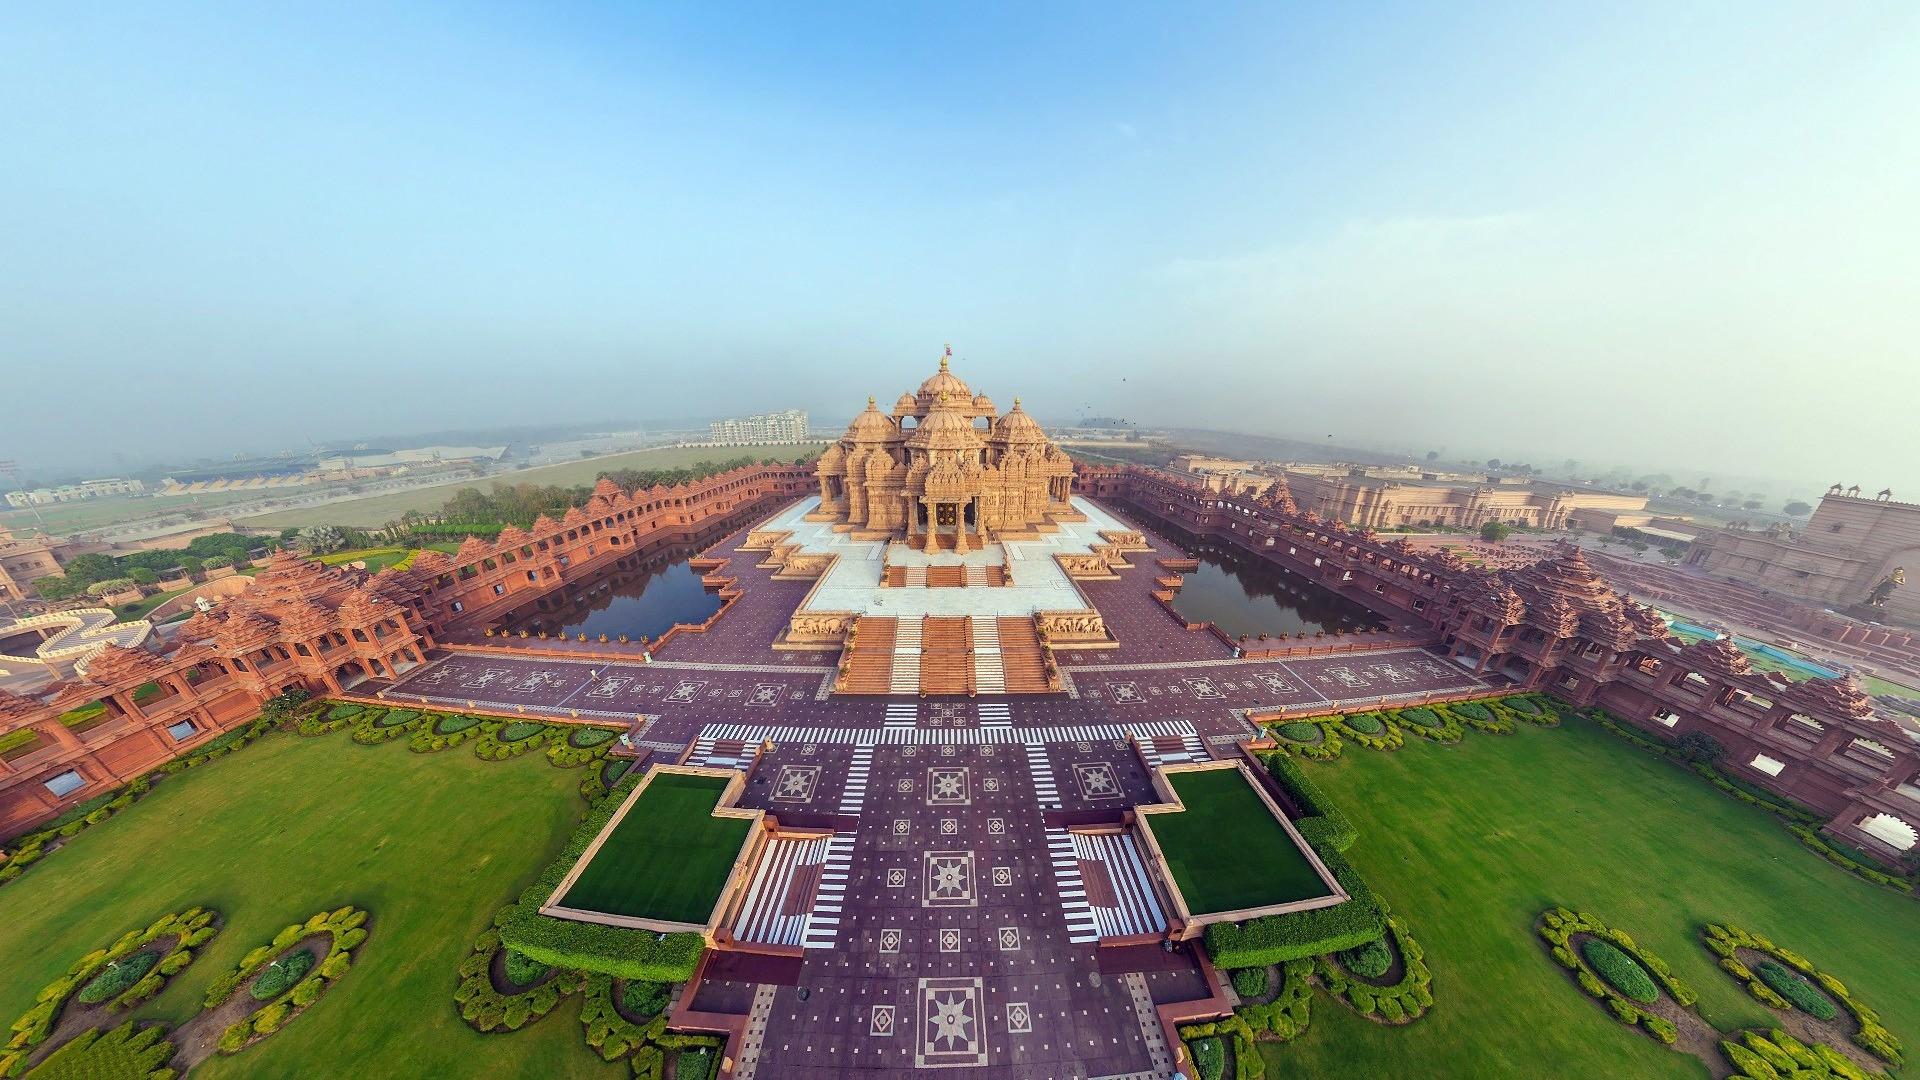 Download 1920x1080 HD Wallpaper akshardham hindu aerial view 1920x1080